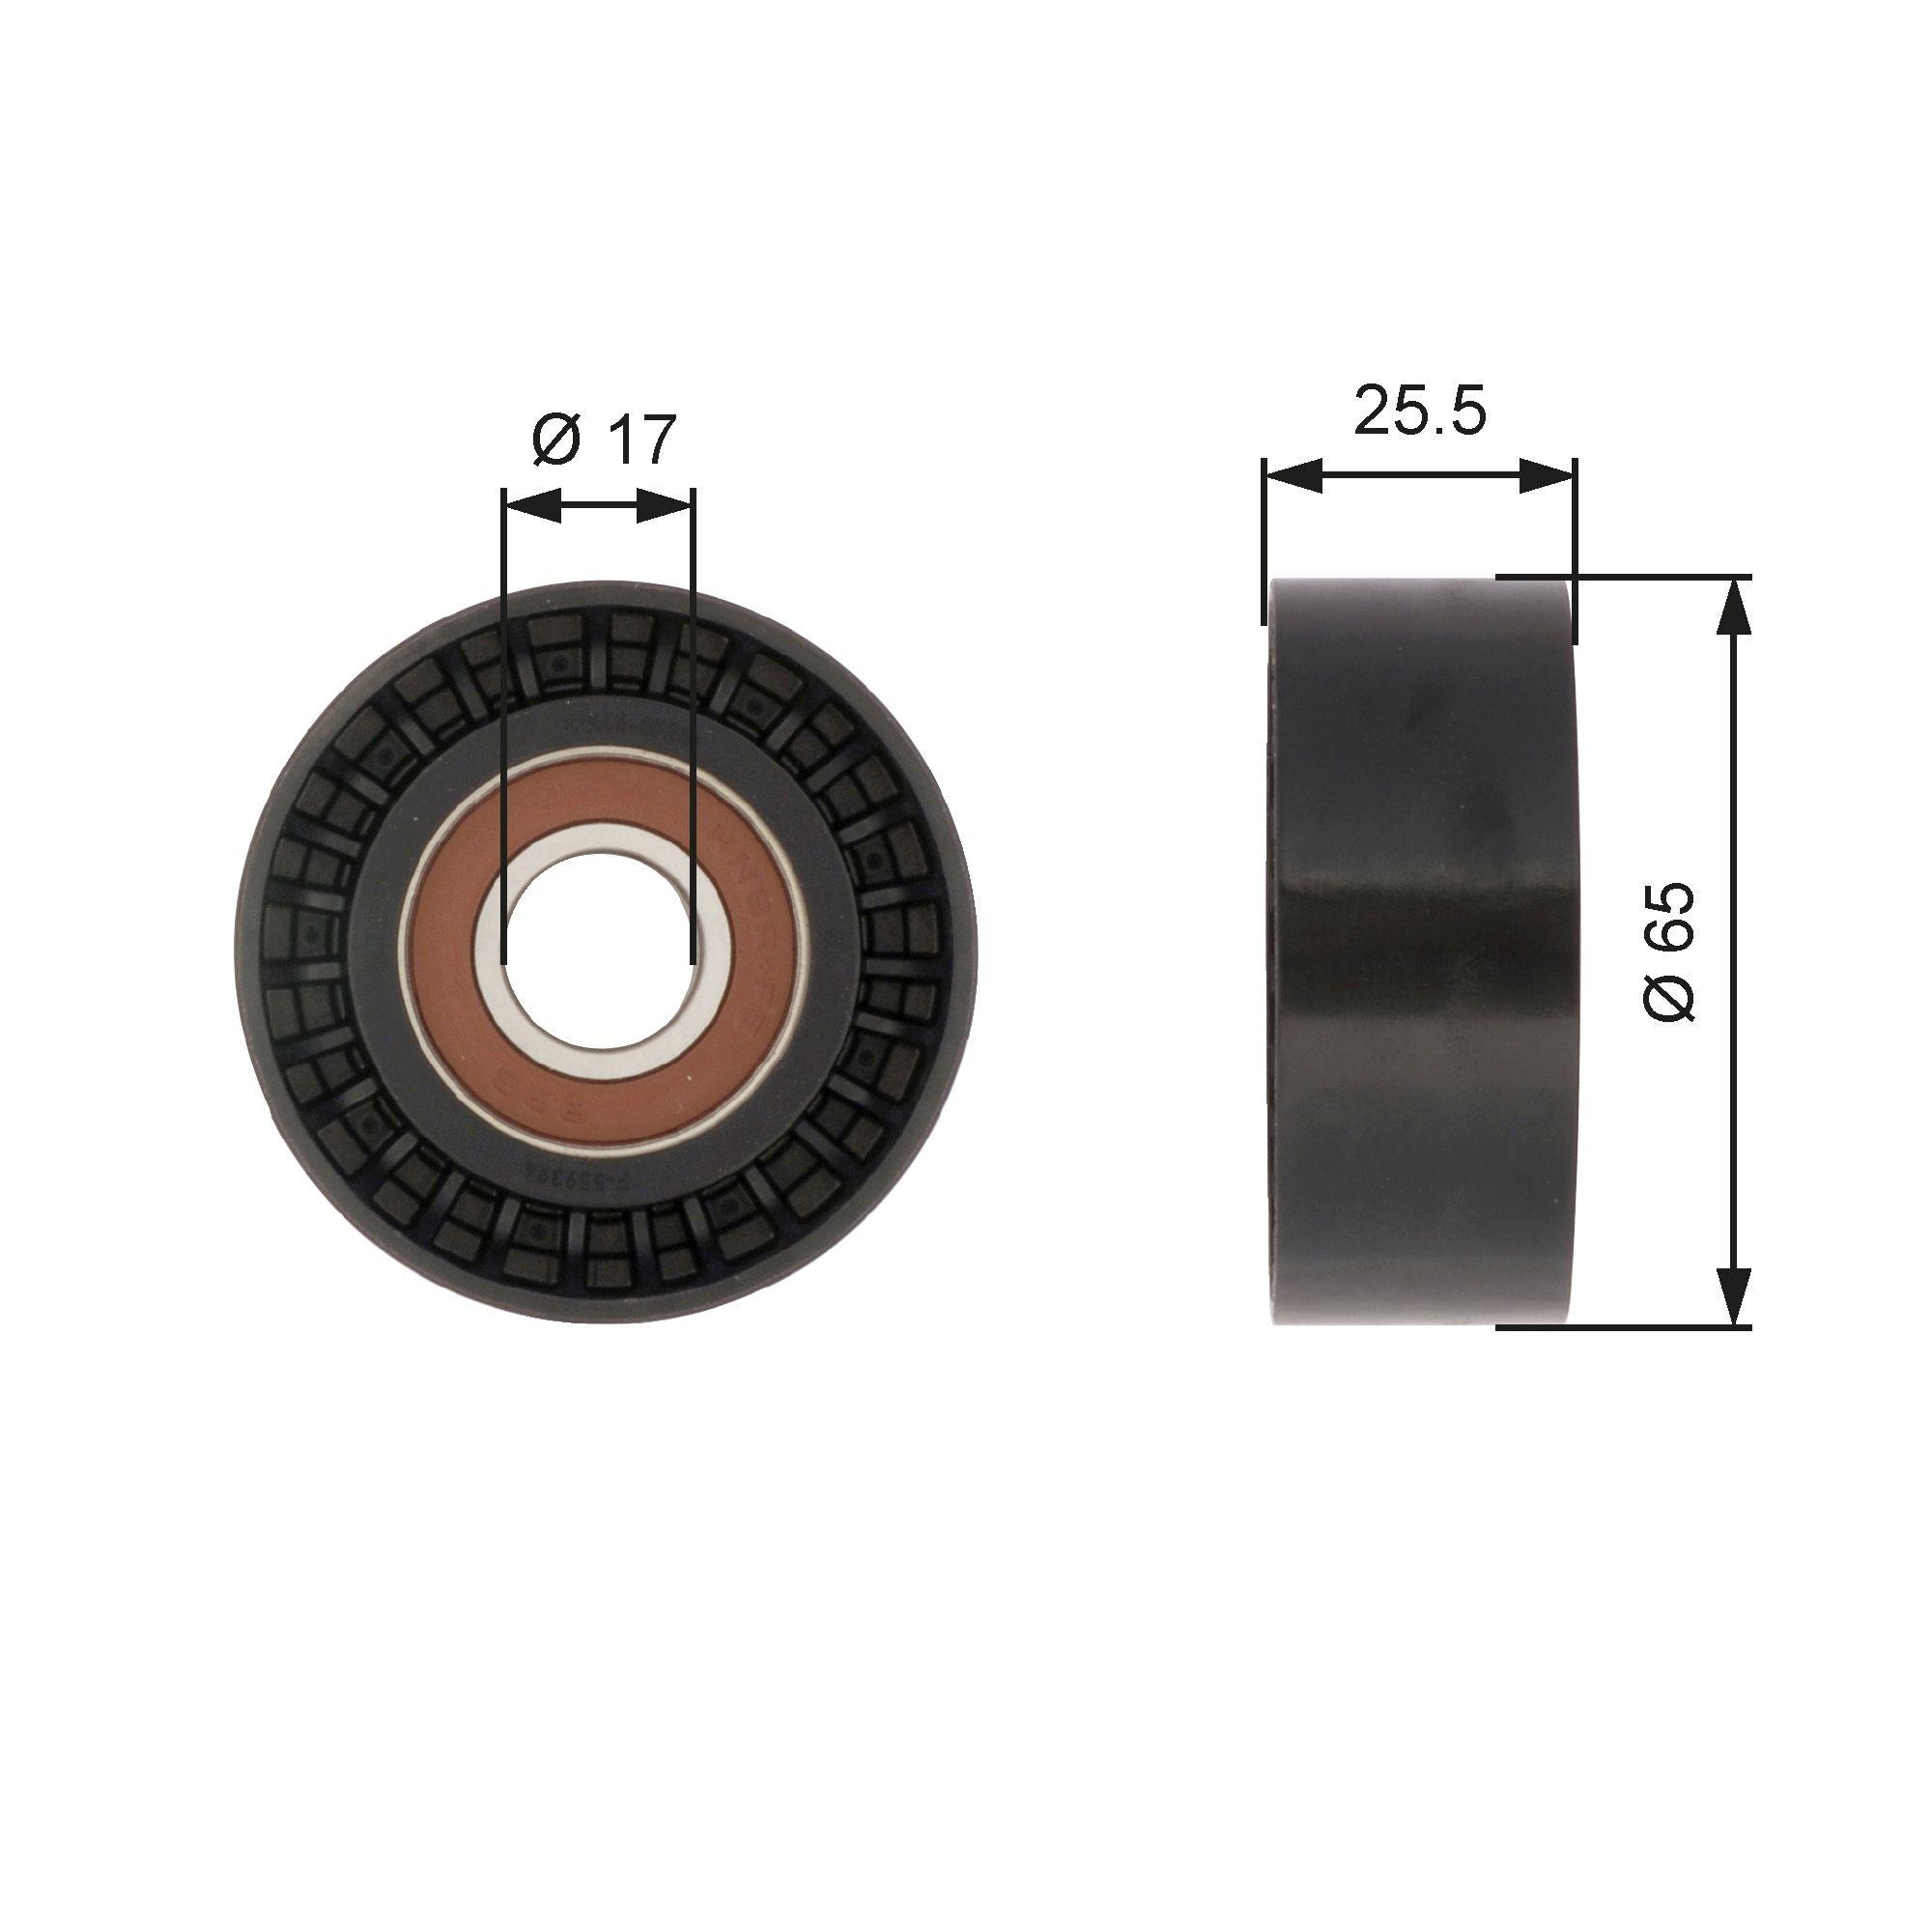 GATES FleetRunner™ Micro-V® Stretch Fit® T43059 Spannrolle, Zahnriemen